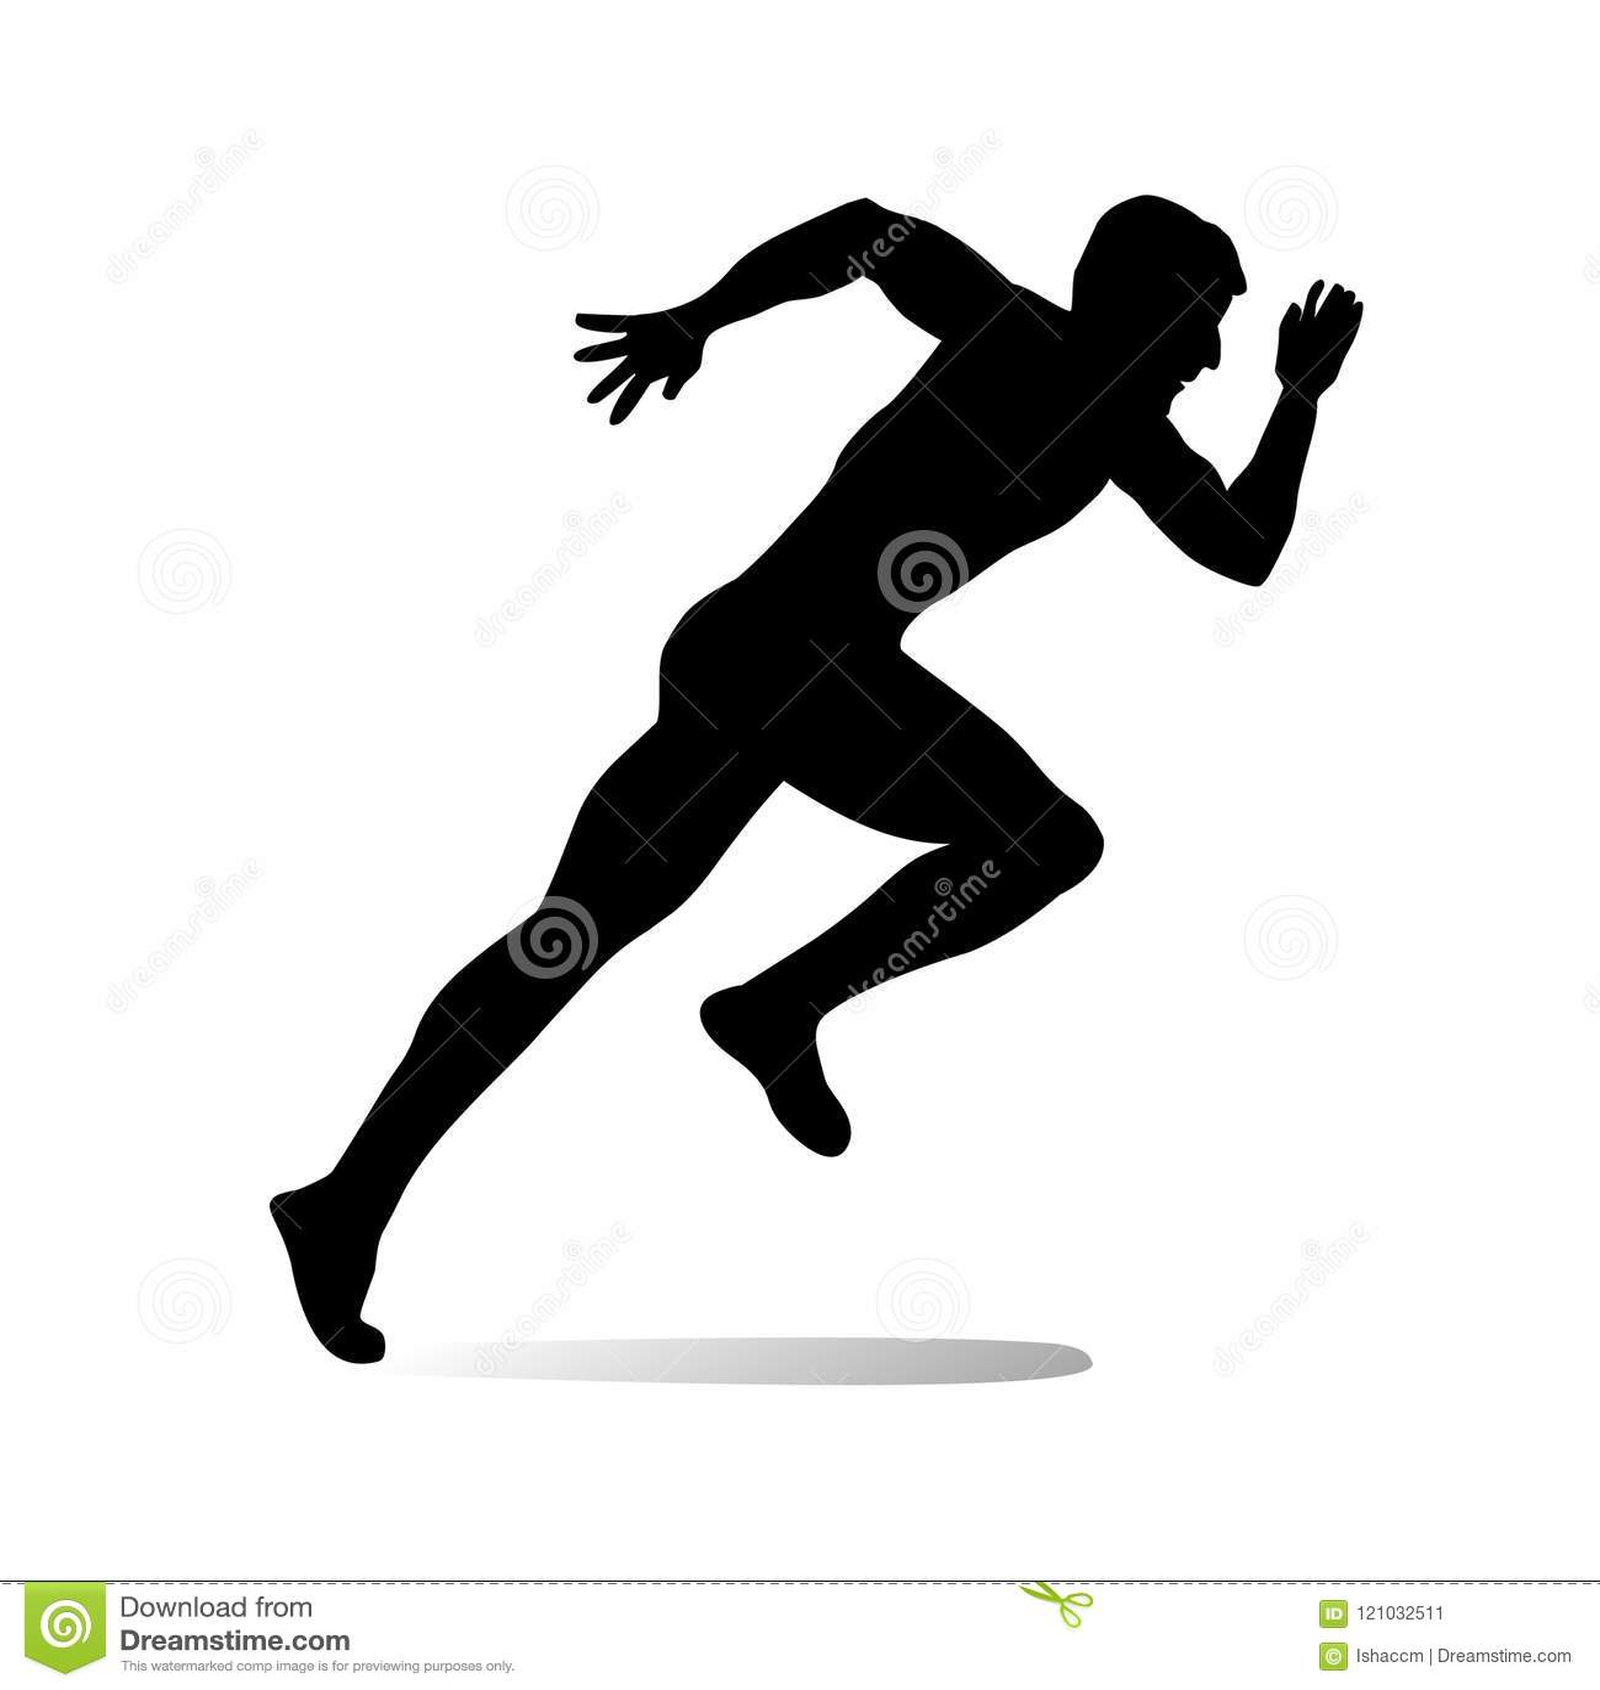 athlete silhouette vector.sports illustration. stock vector - illustration  of marathone, athlete: 121032511  dreamstime.com